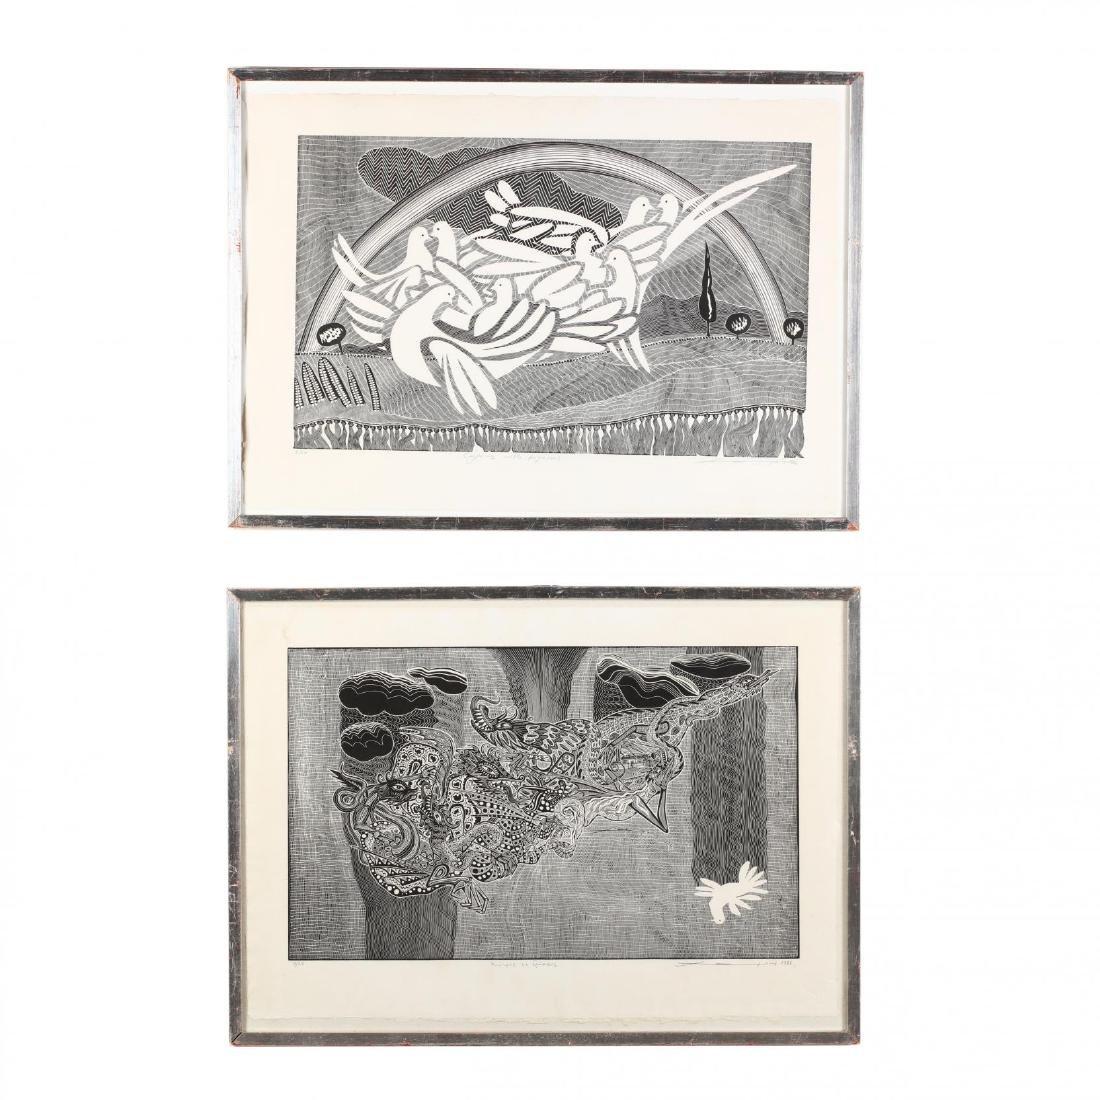 Hambis Tsangaris (Cypriot, b. 1947), Two Visions of